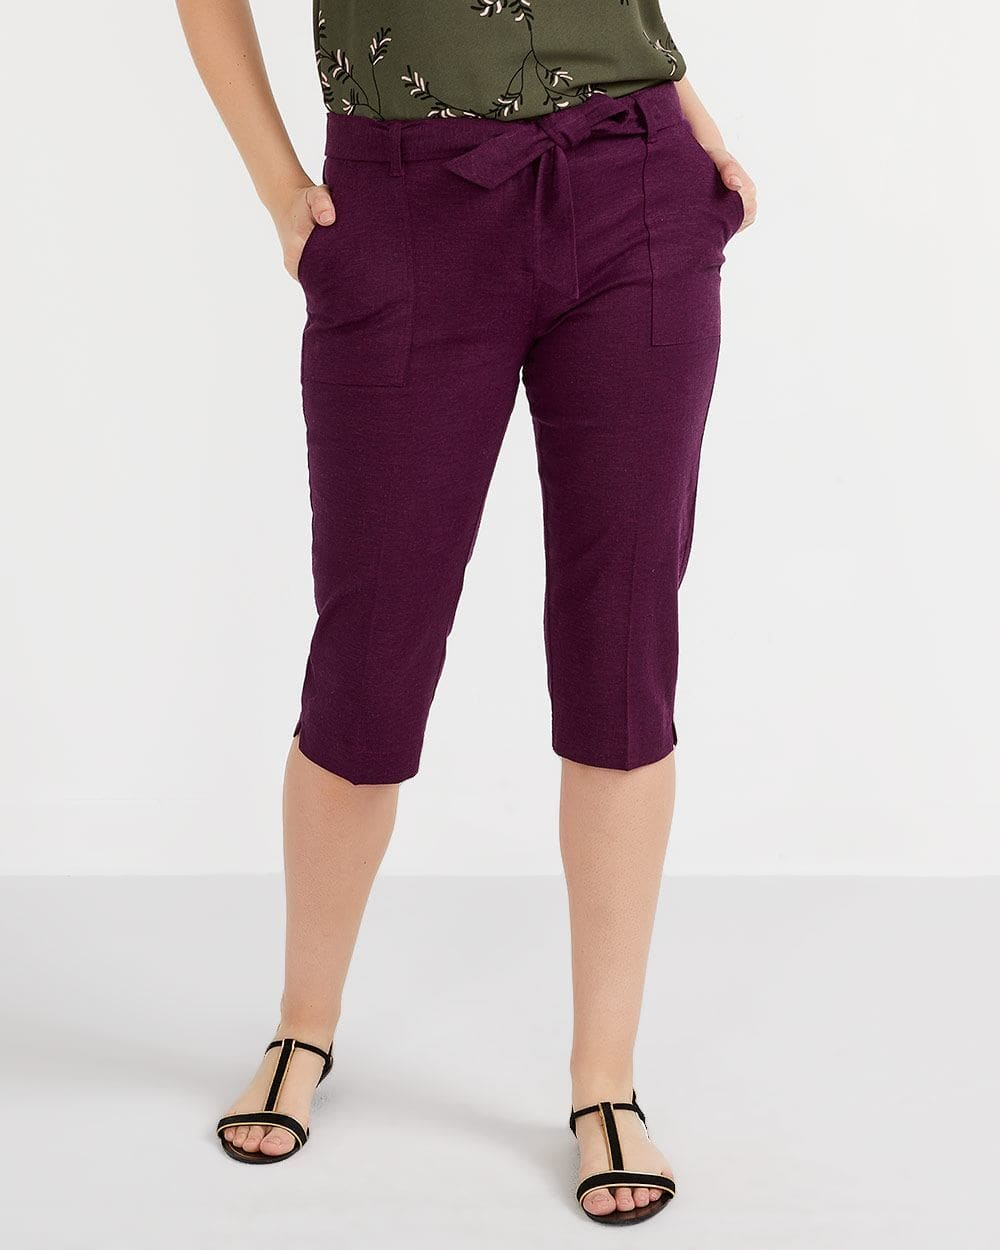 Pantalon capri en mélange de lin Petite